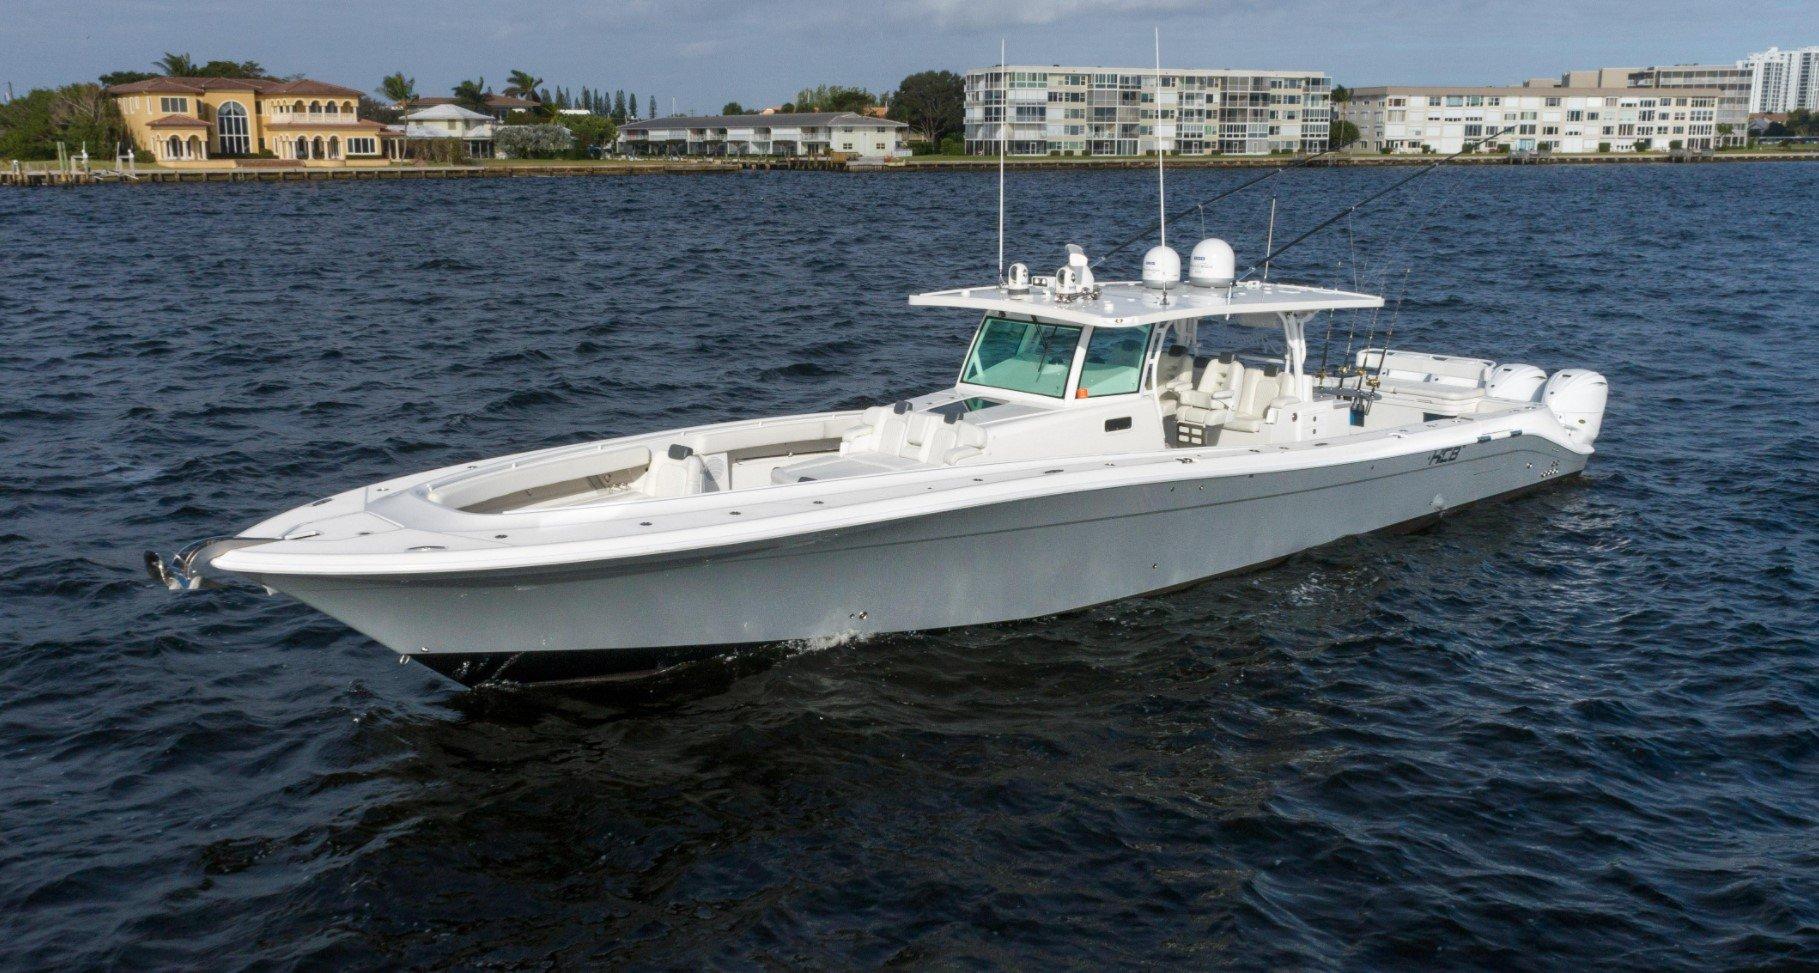 53' HCB Open highspeed Fishing Motor Yacht ''Milling Around''